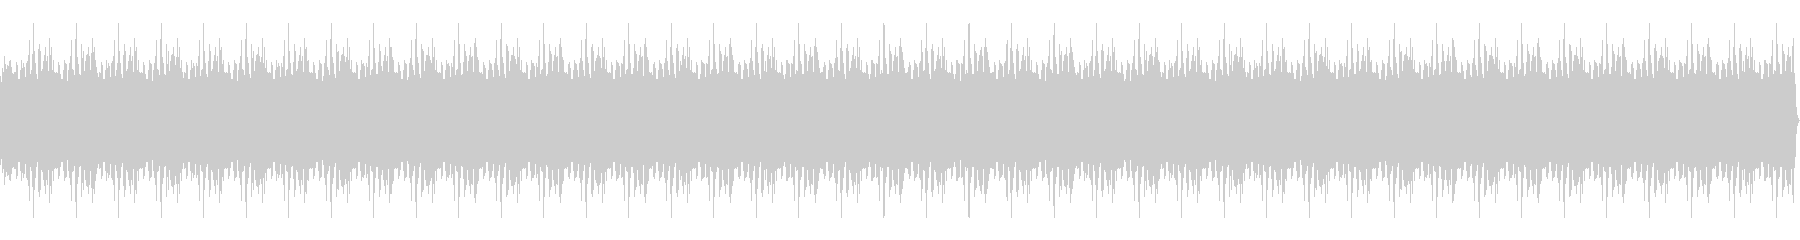 【174Hz】を想定のヒーリング曲です。の未再生の波形